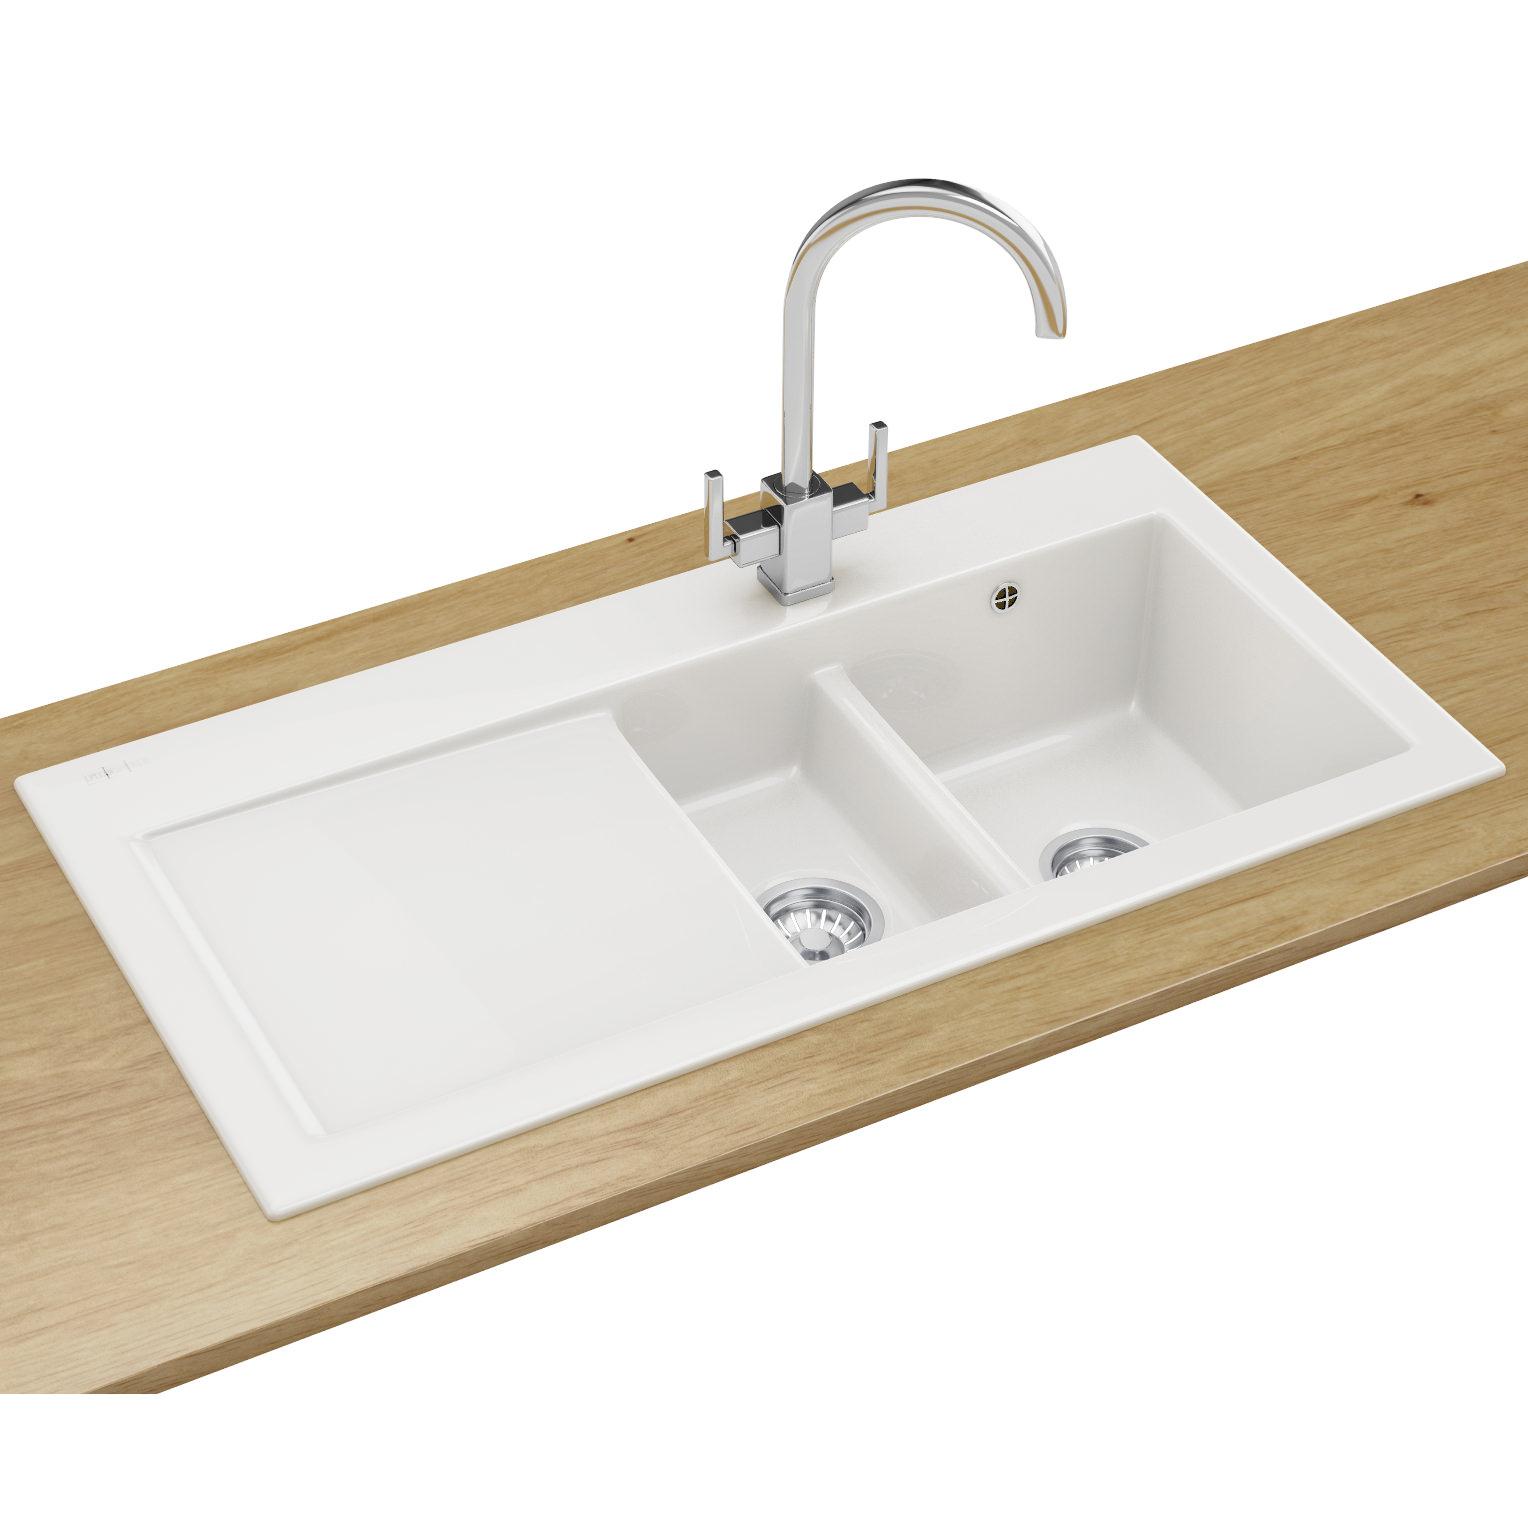 white kitchen sink Franke Mythos Designer Pack MTK Ceramic White Kitchen Sink And Tap